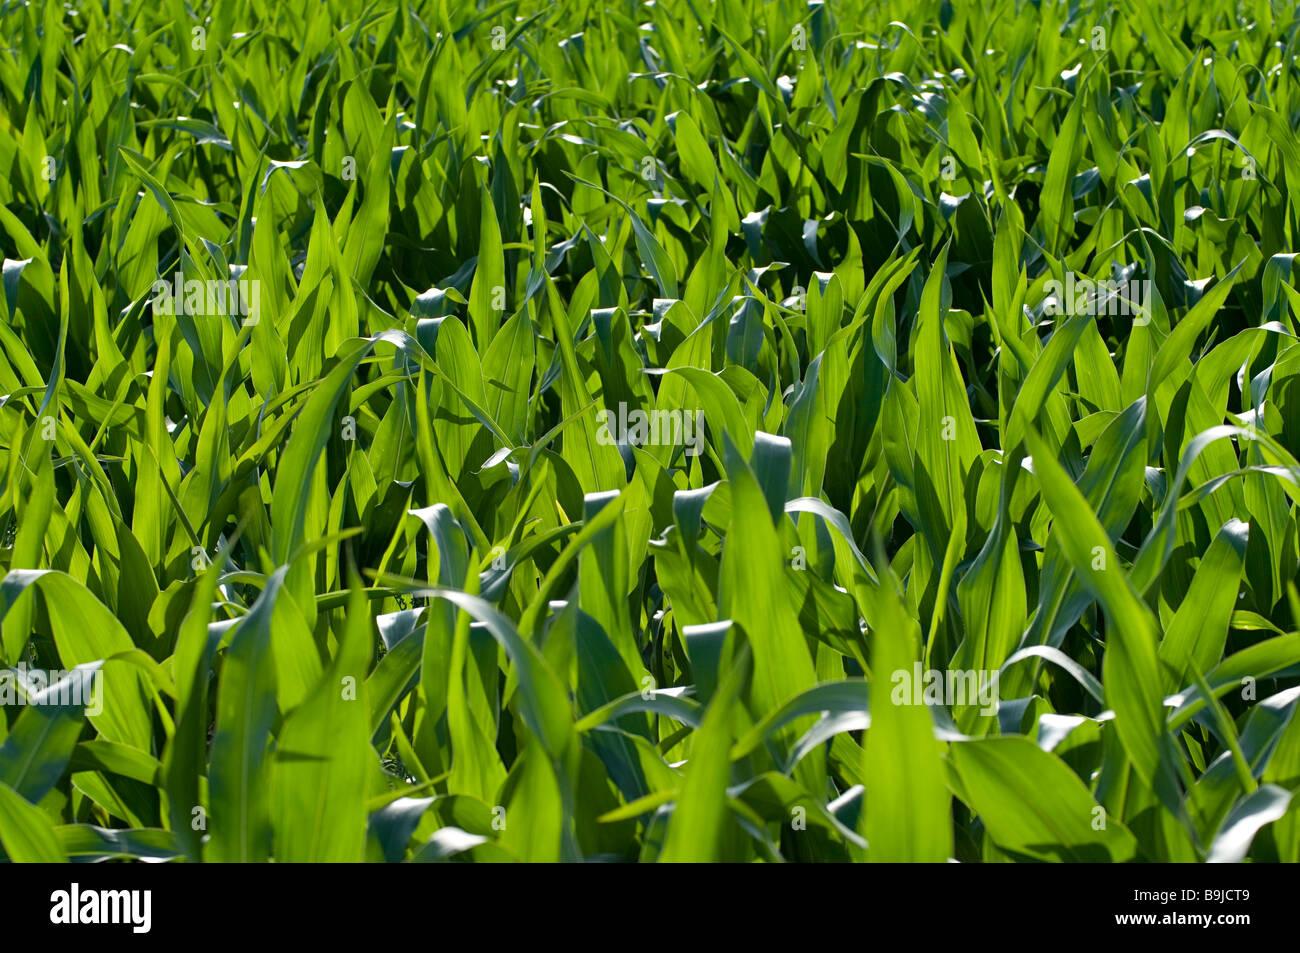 Cornfield (Zea mays) - Stock Image